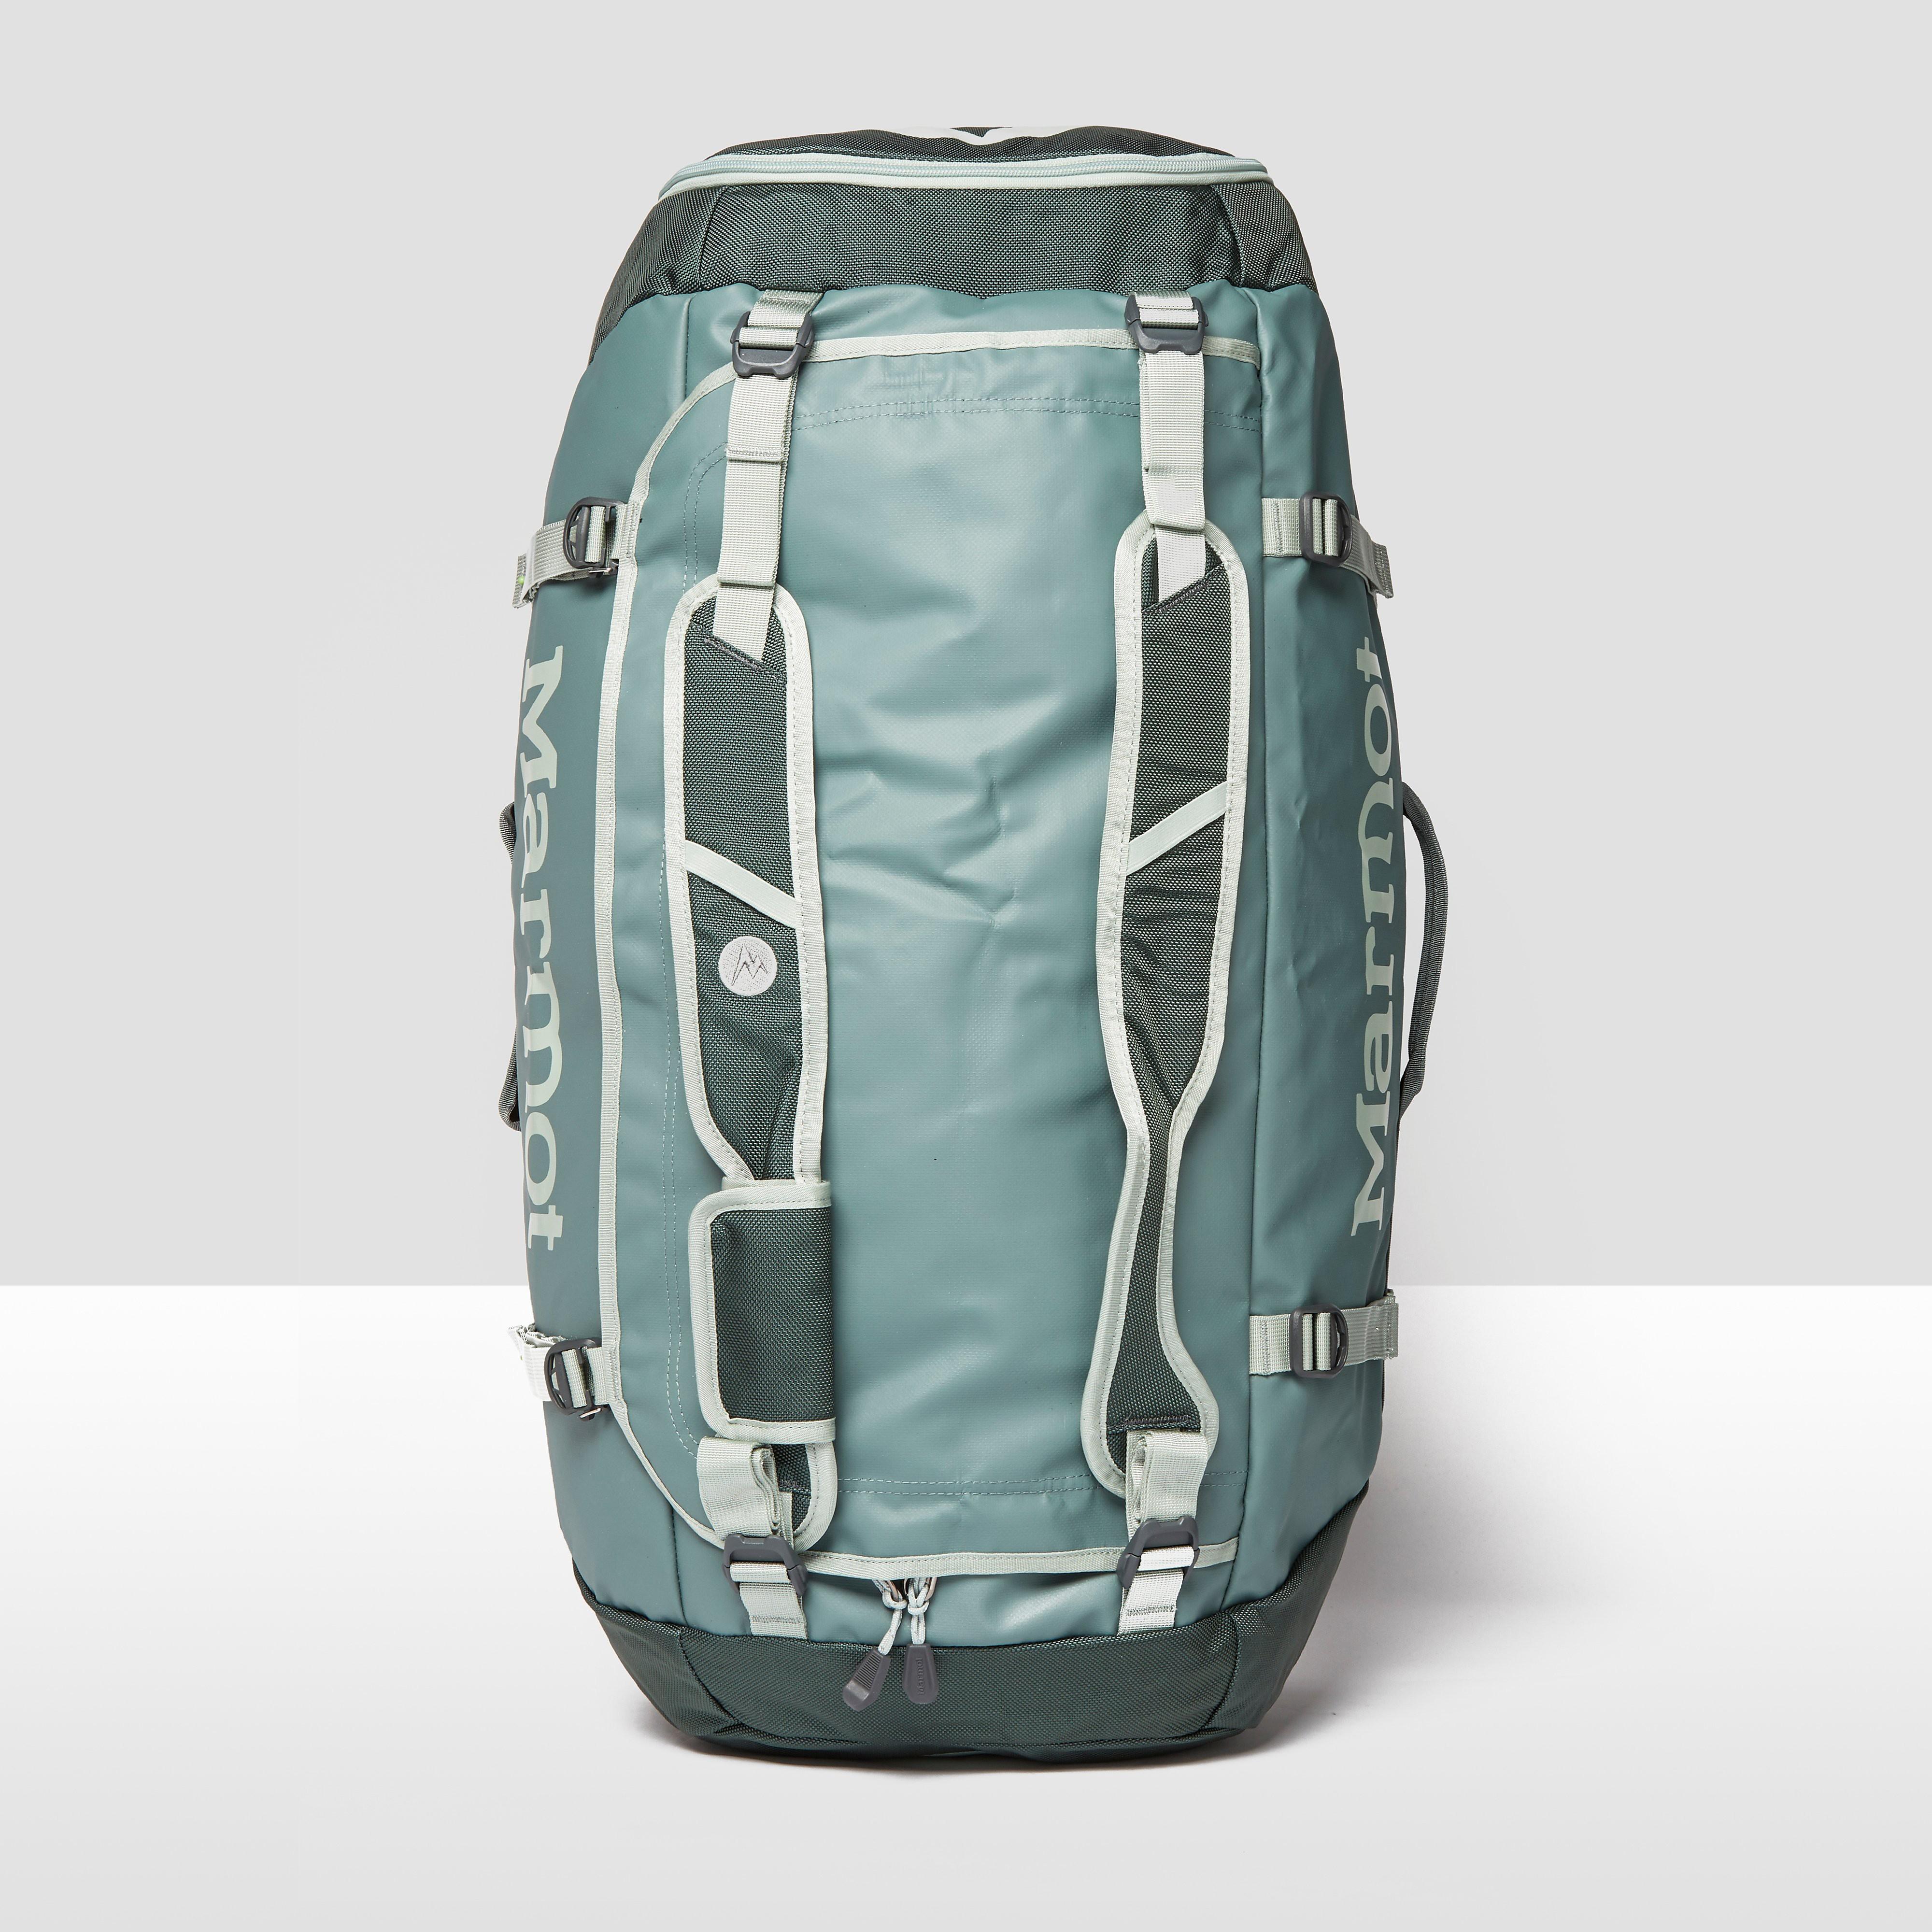 MARMOT Large Hauler Duffel Bag